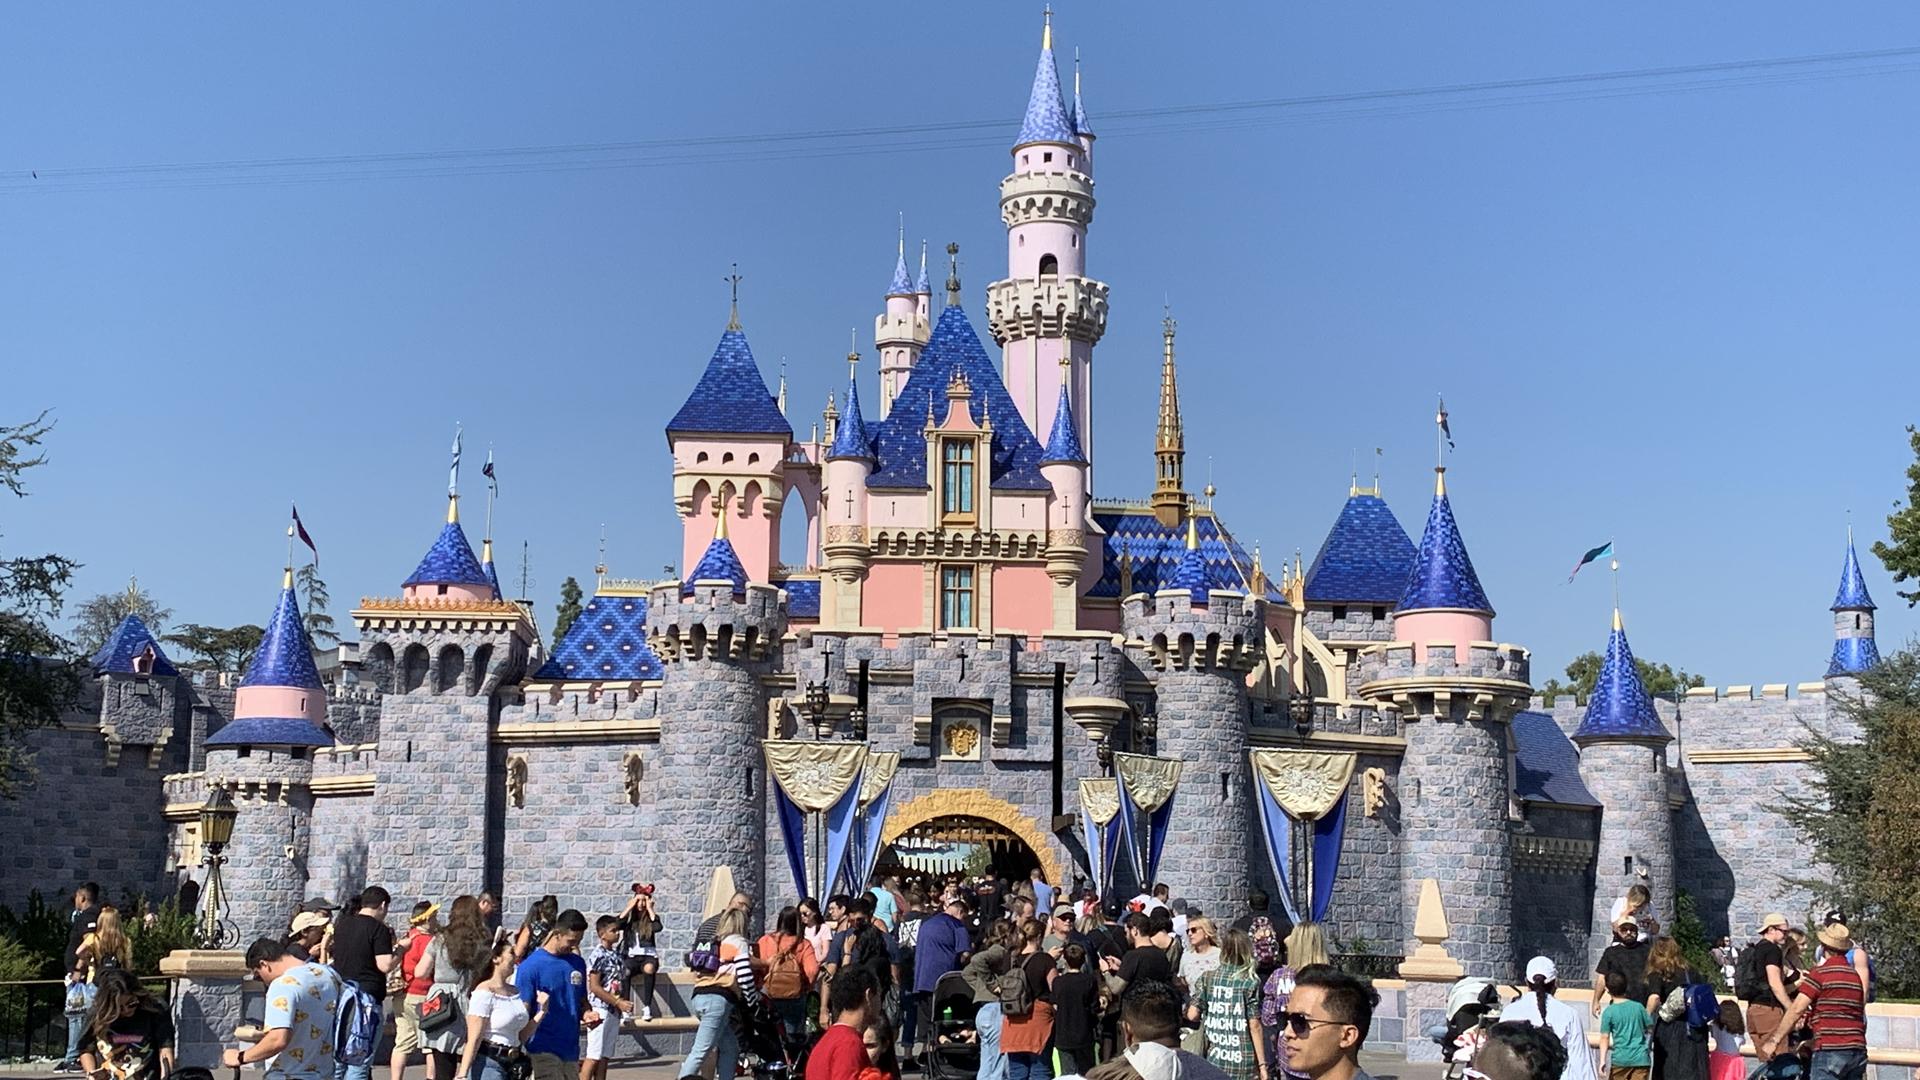 The Sleeping Beauty castle is seen at Disneyland on Oct. 14, 2019. (KTLA)